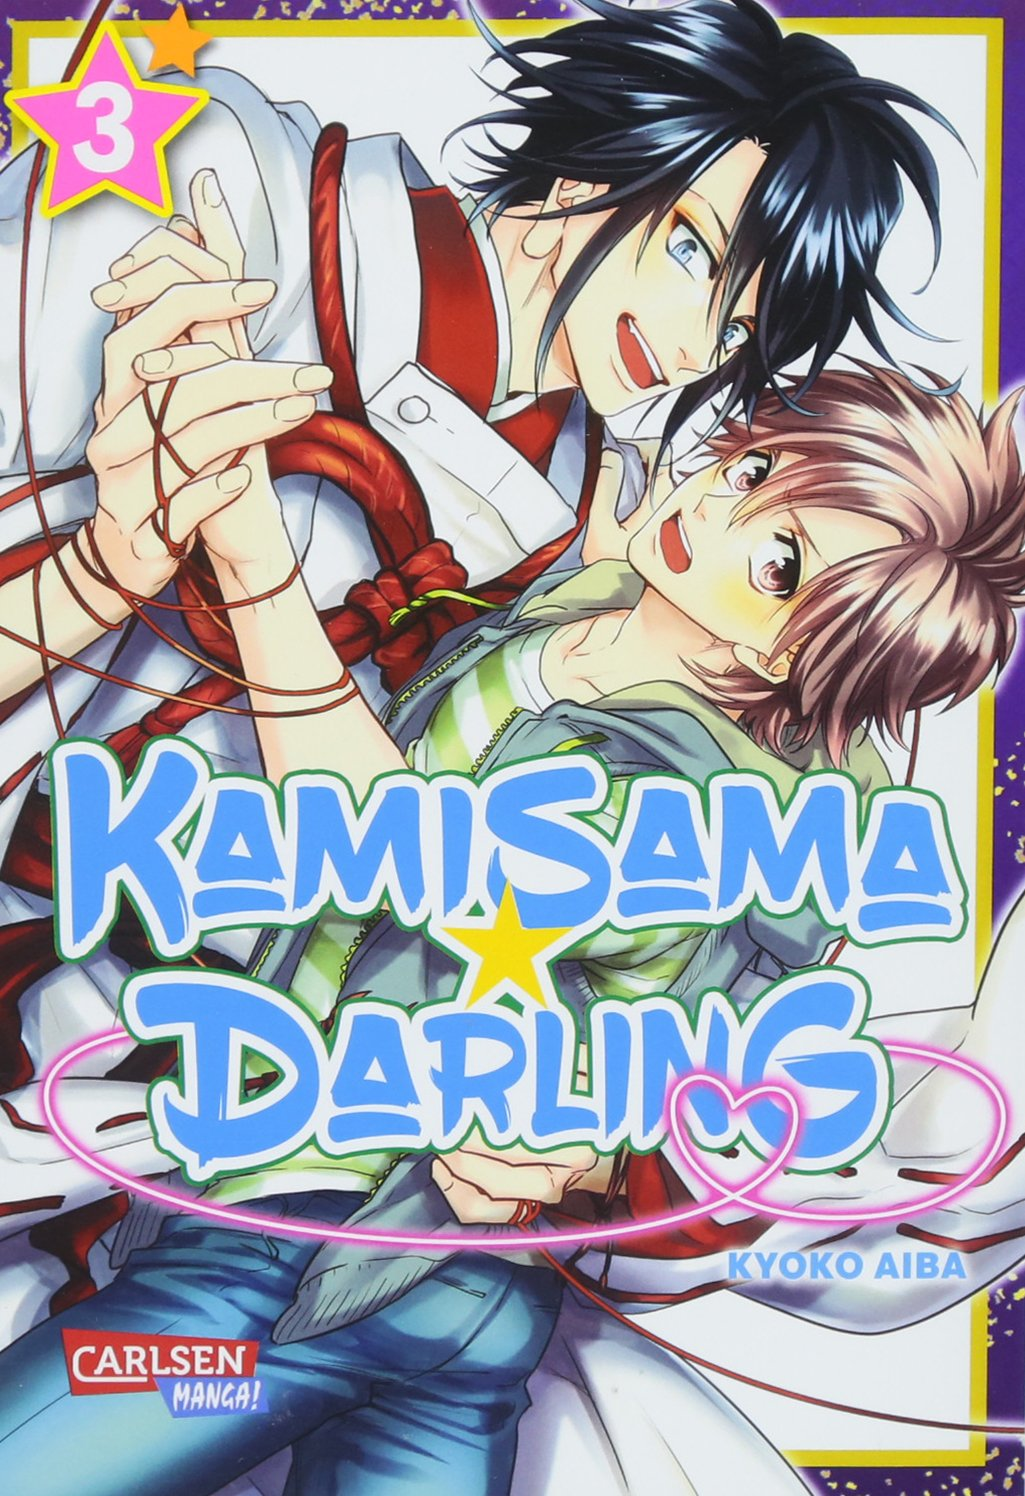 Kamisama Darling 3 Taschenbuch – 30. Mai 2018 Kyoko Aiba Dorothea Überall Carlsen 3551722285